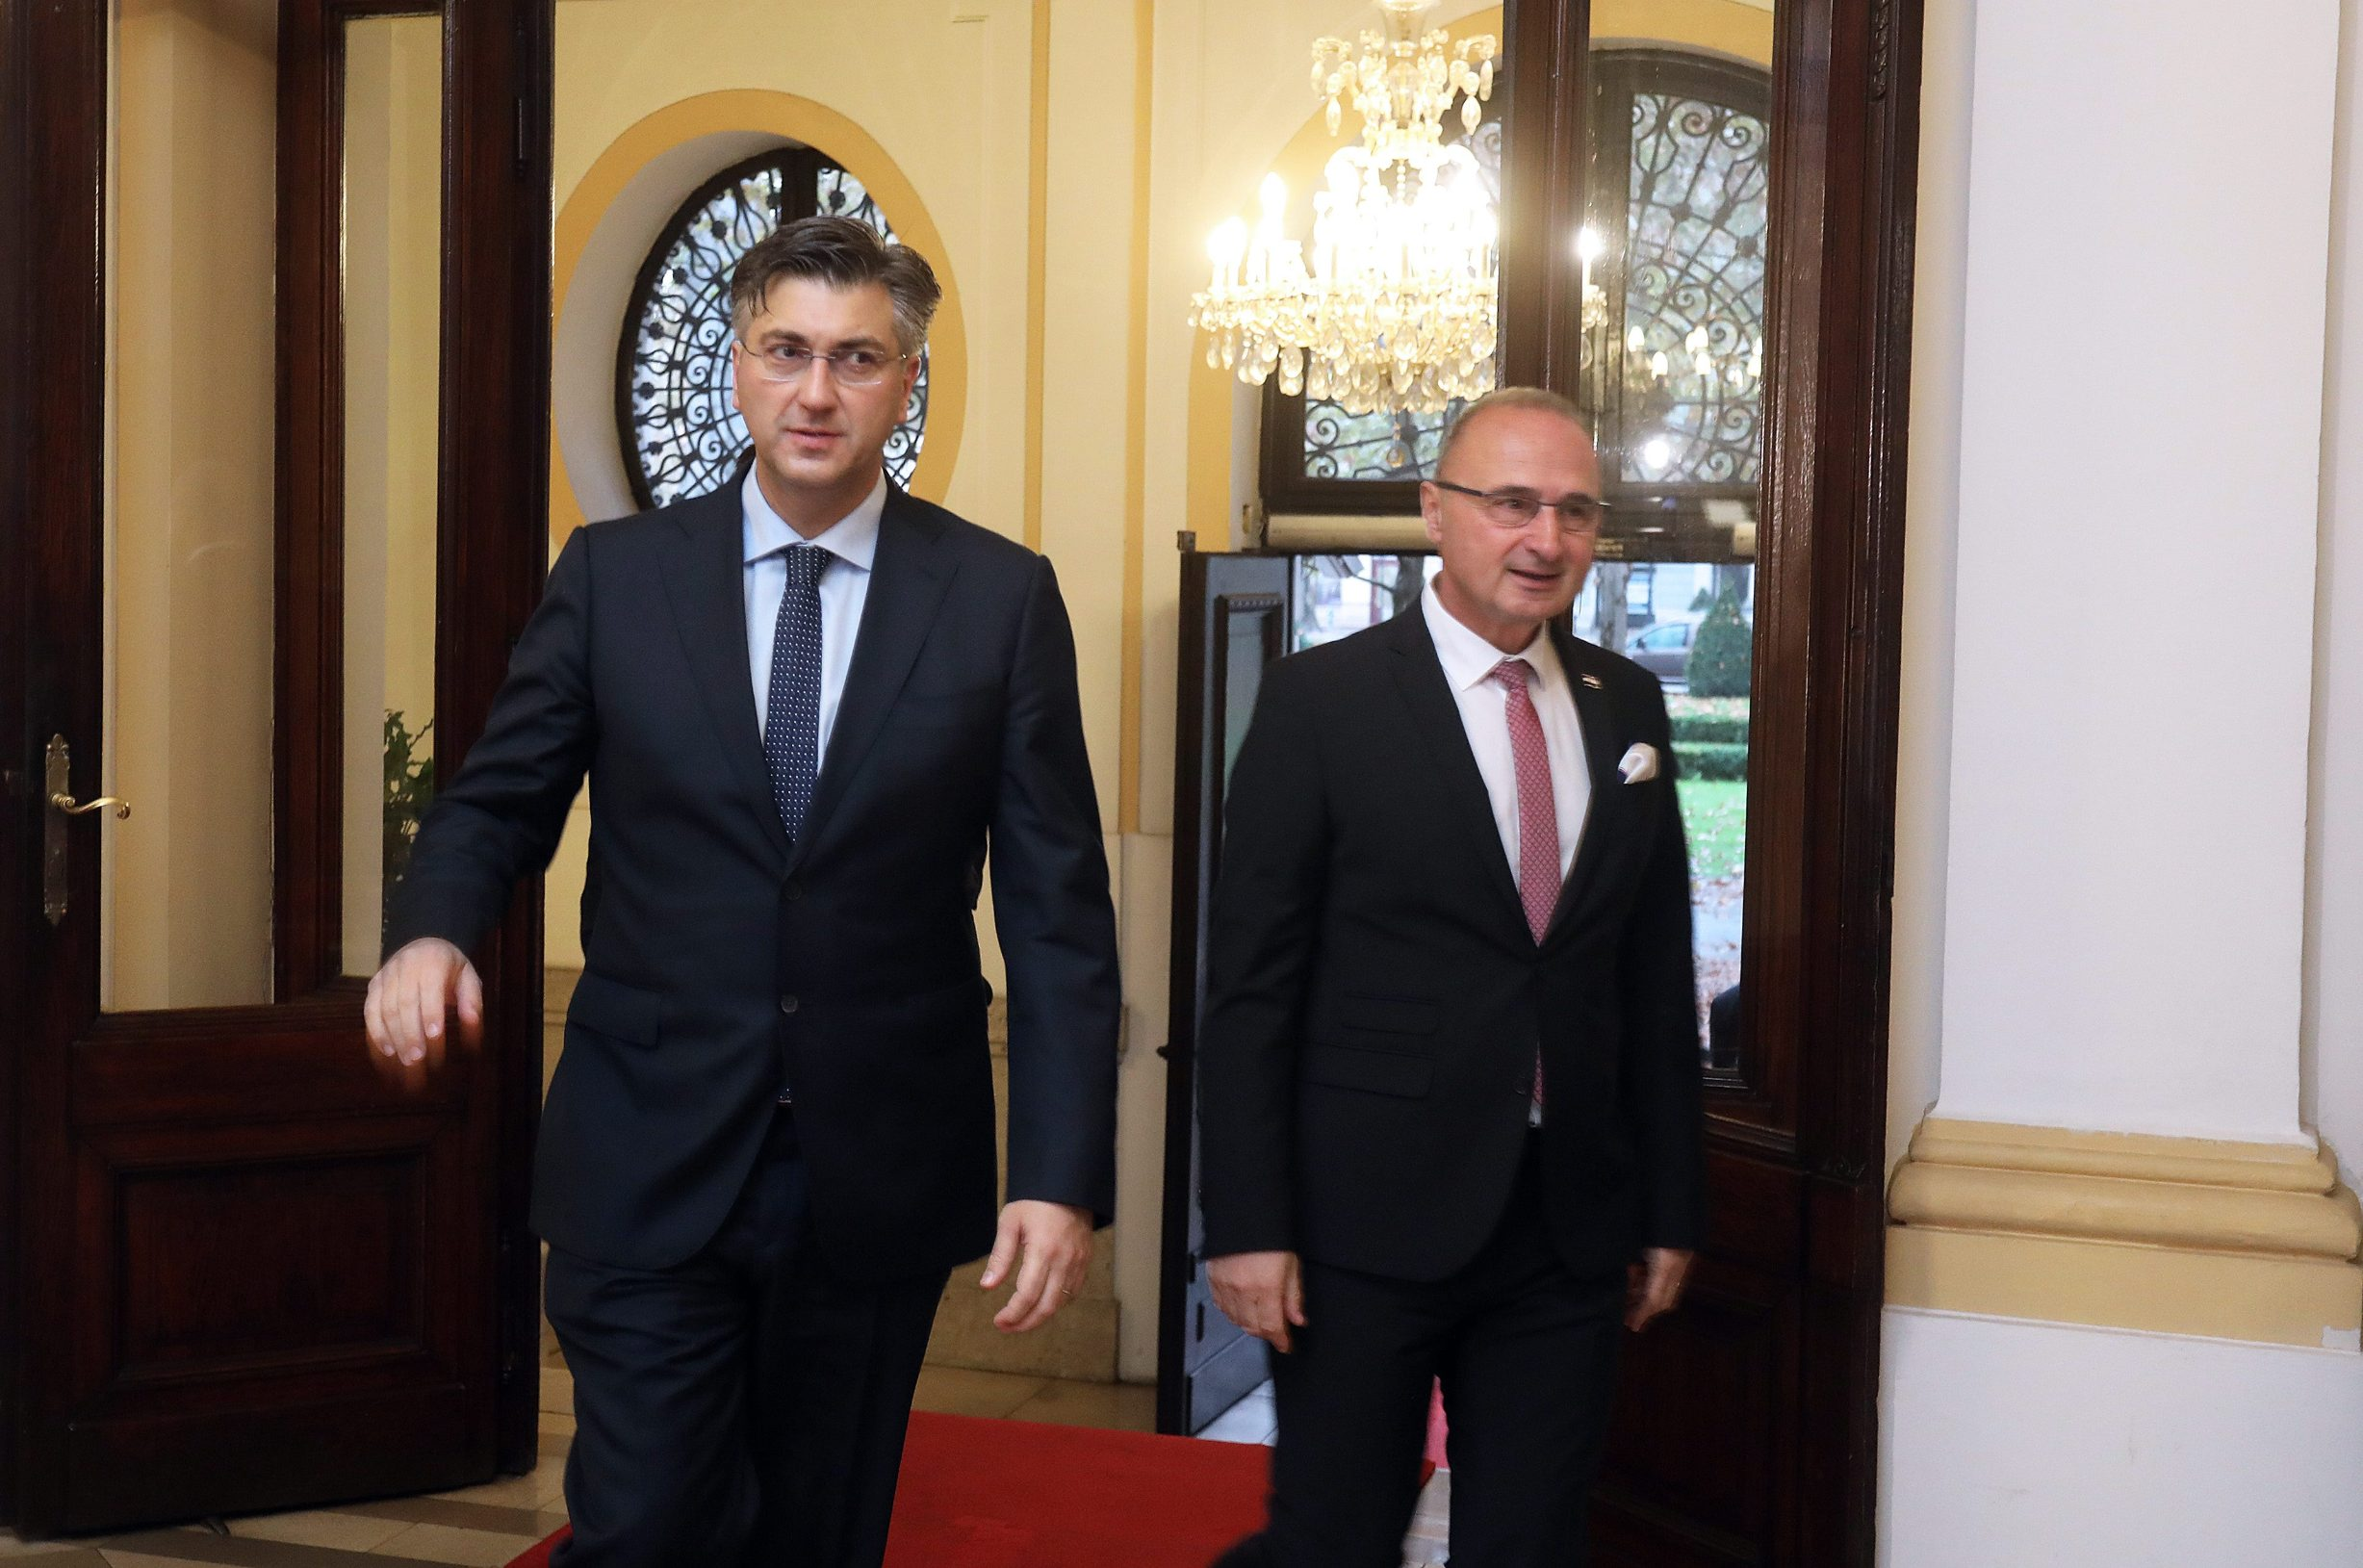 Na fotografiji: Andrej Plenković i Gordan Grlić Radman